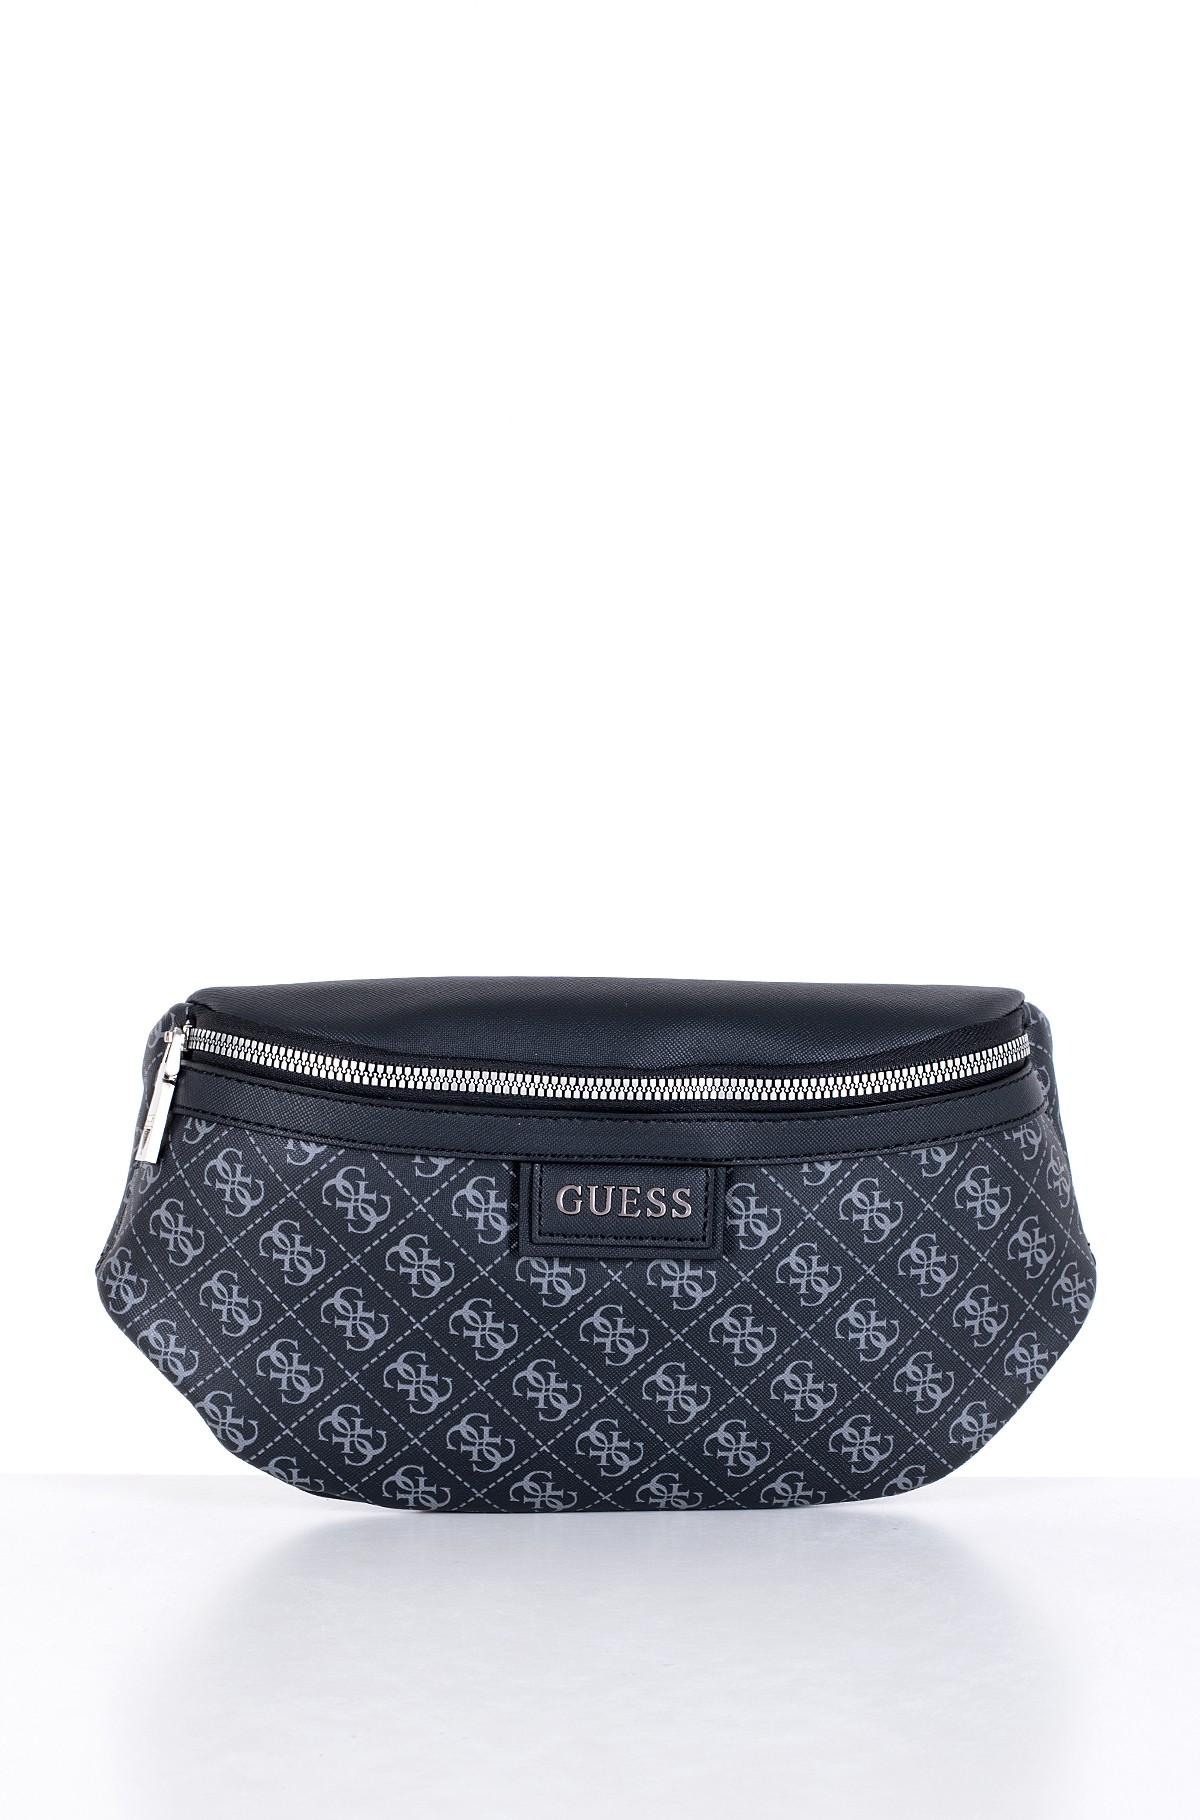 Waist bag/shoulder bag HMDANL P0330-full-2